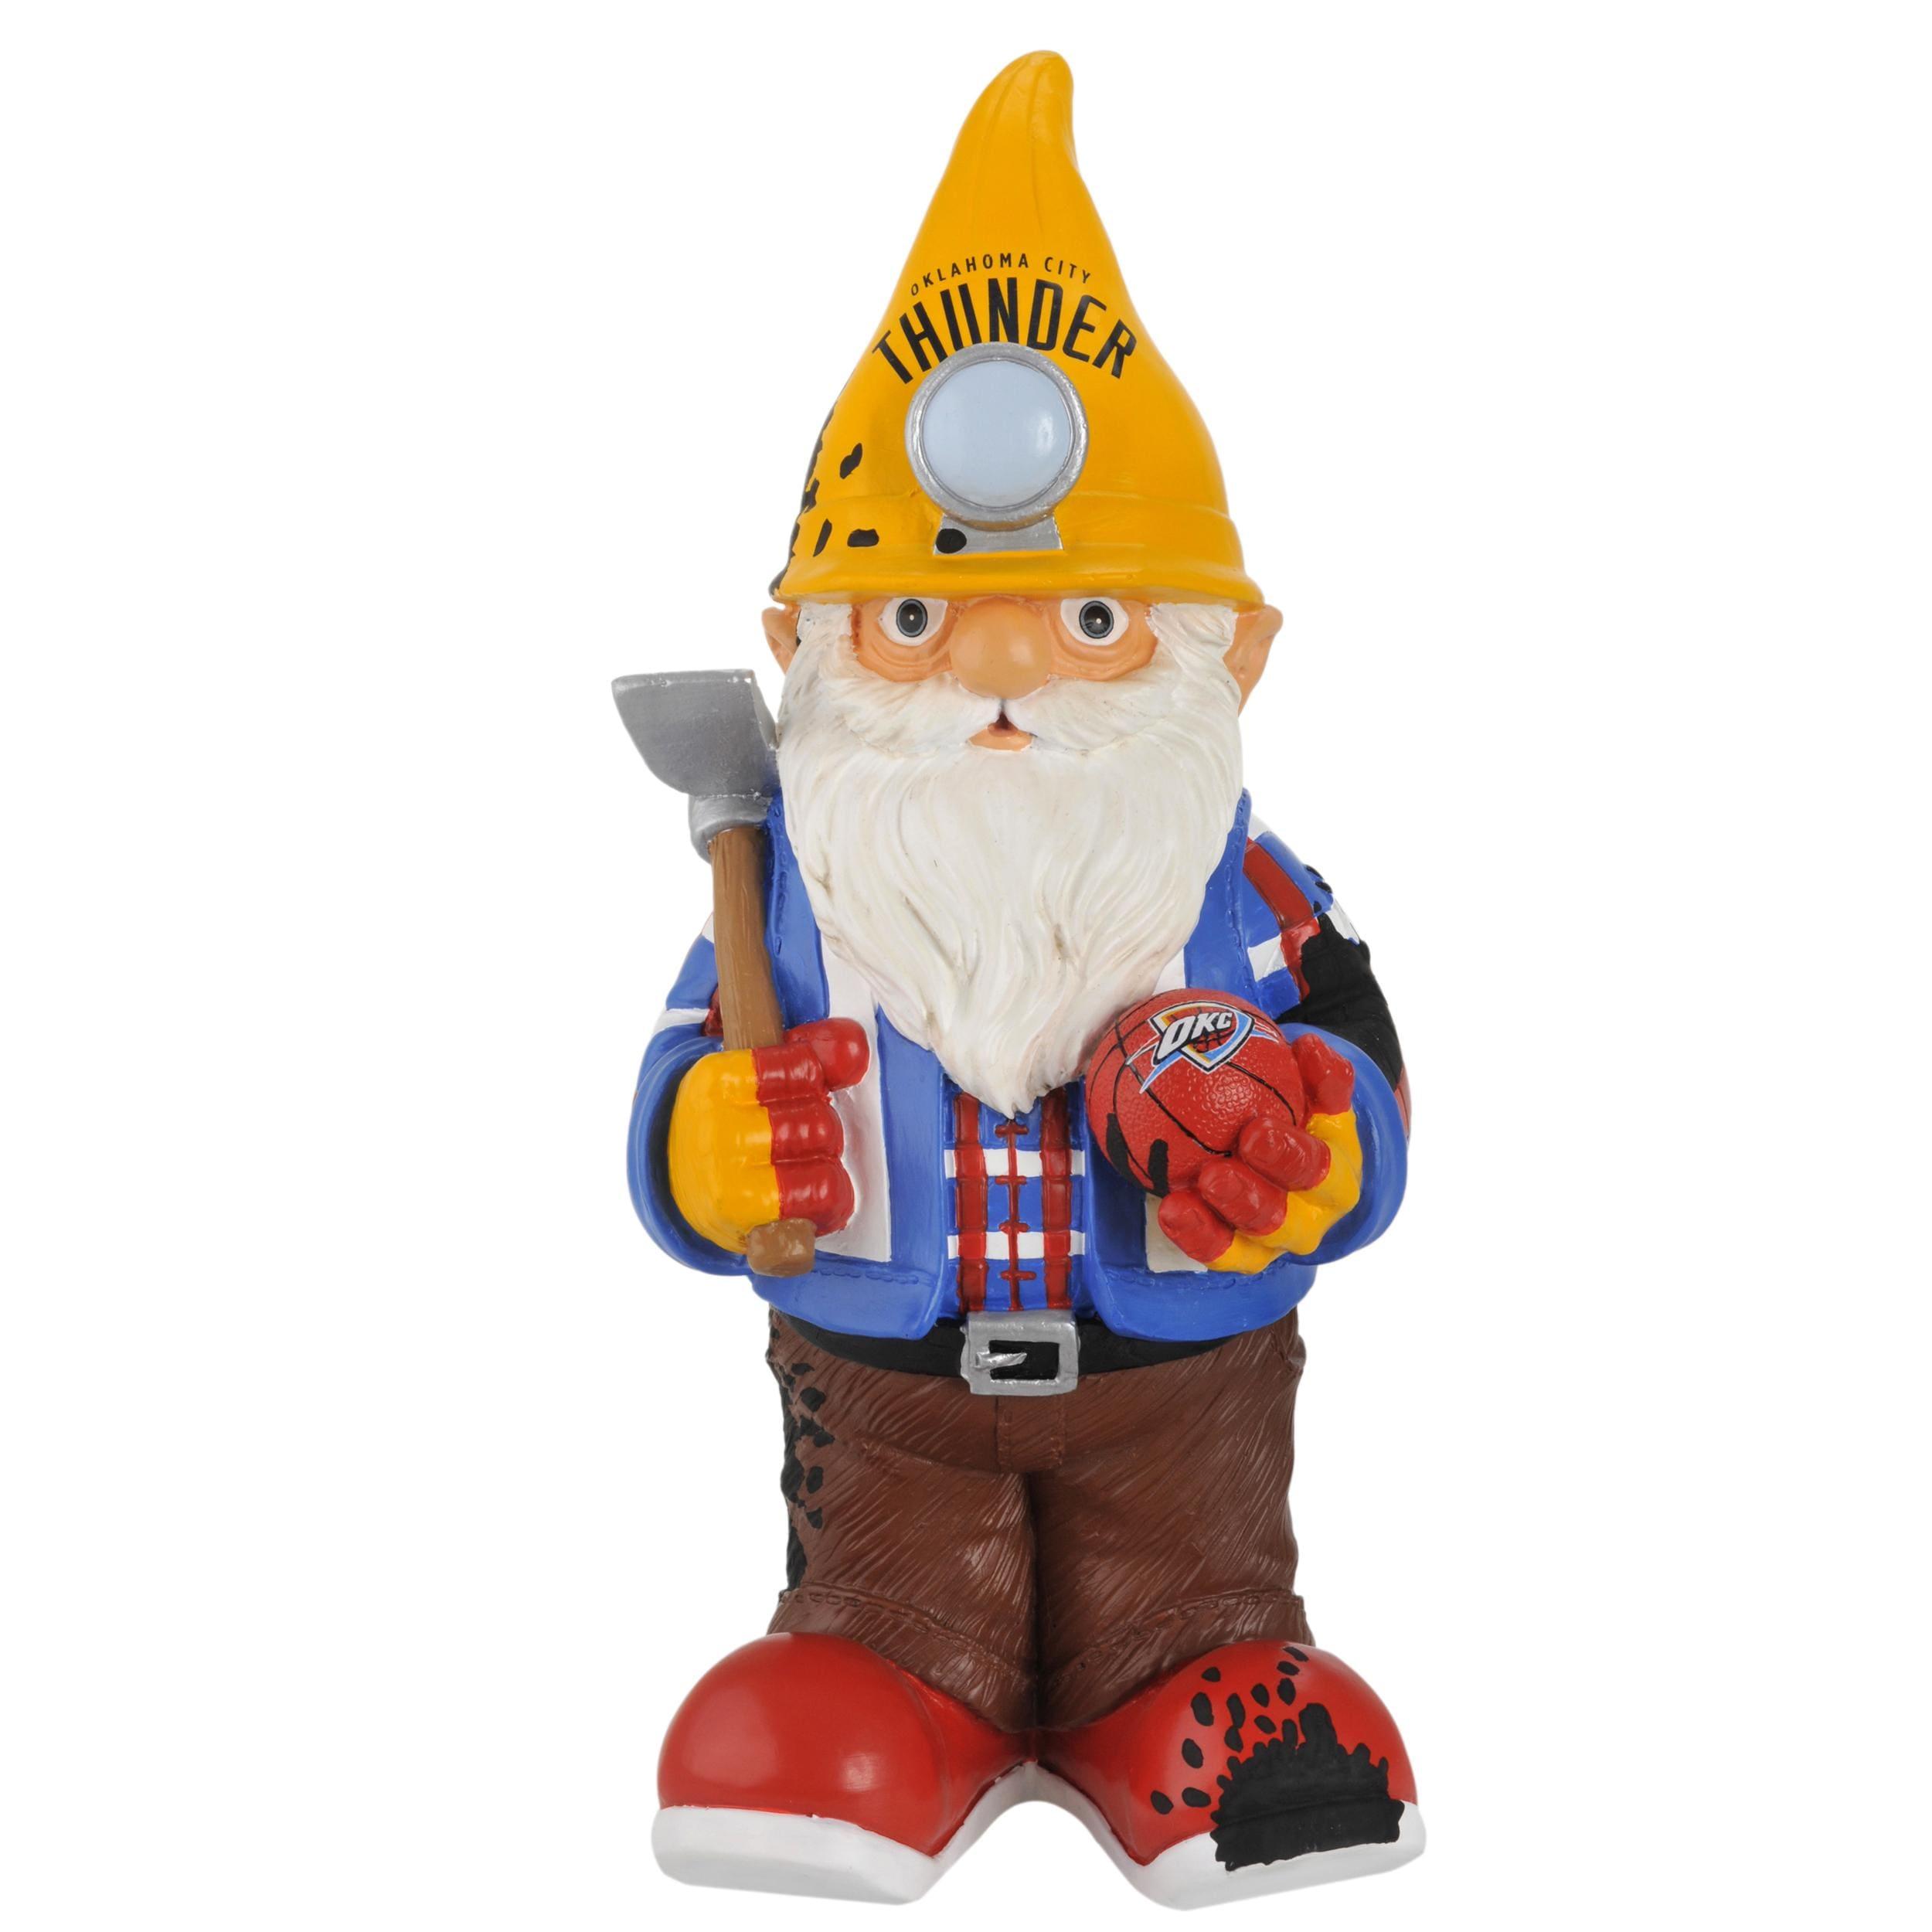 Oklahoma City Thunder 11-inch Thematic Garden Gnome - Thumbnail 1